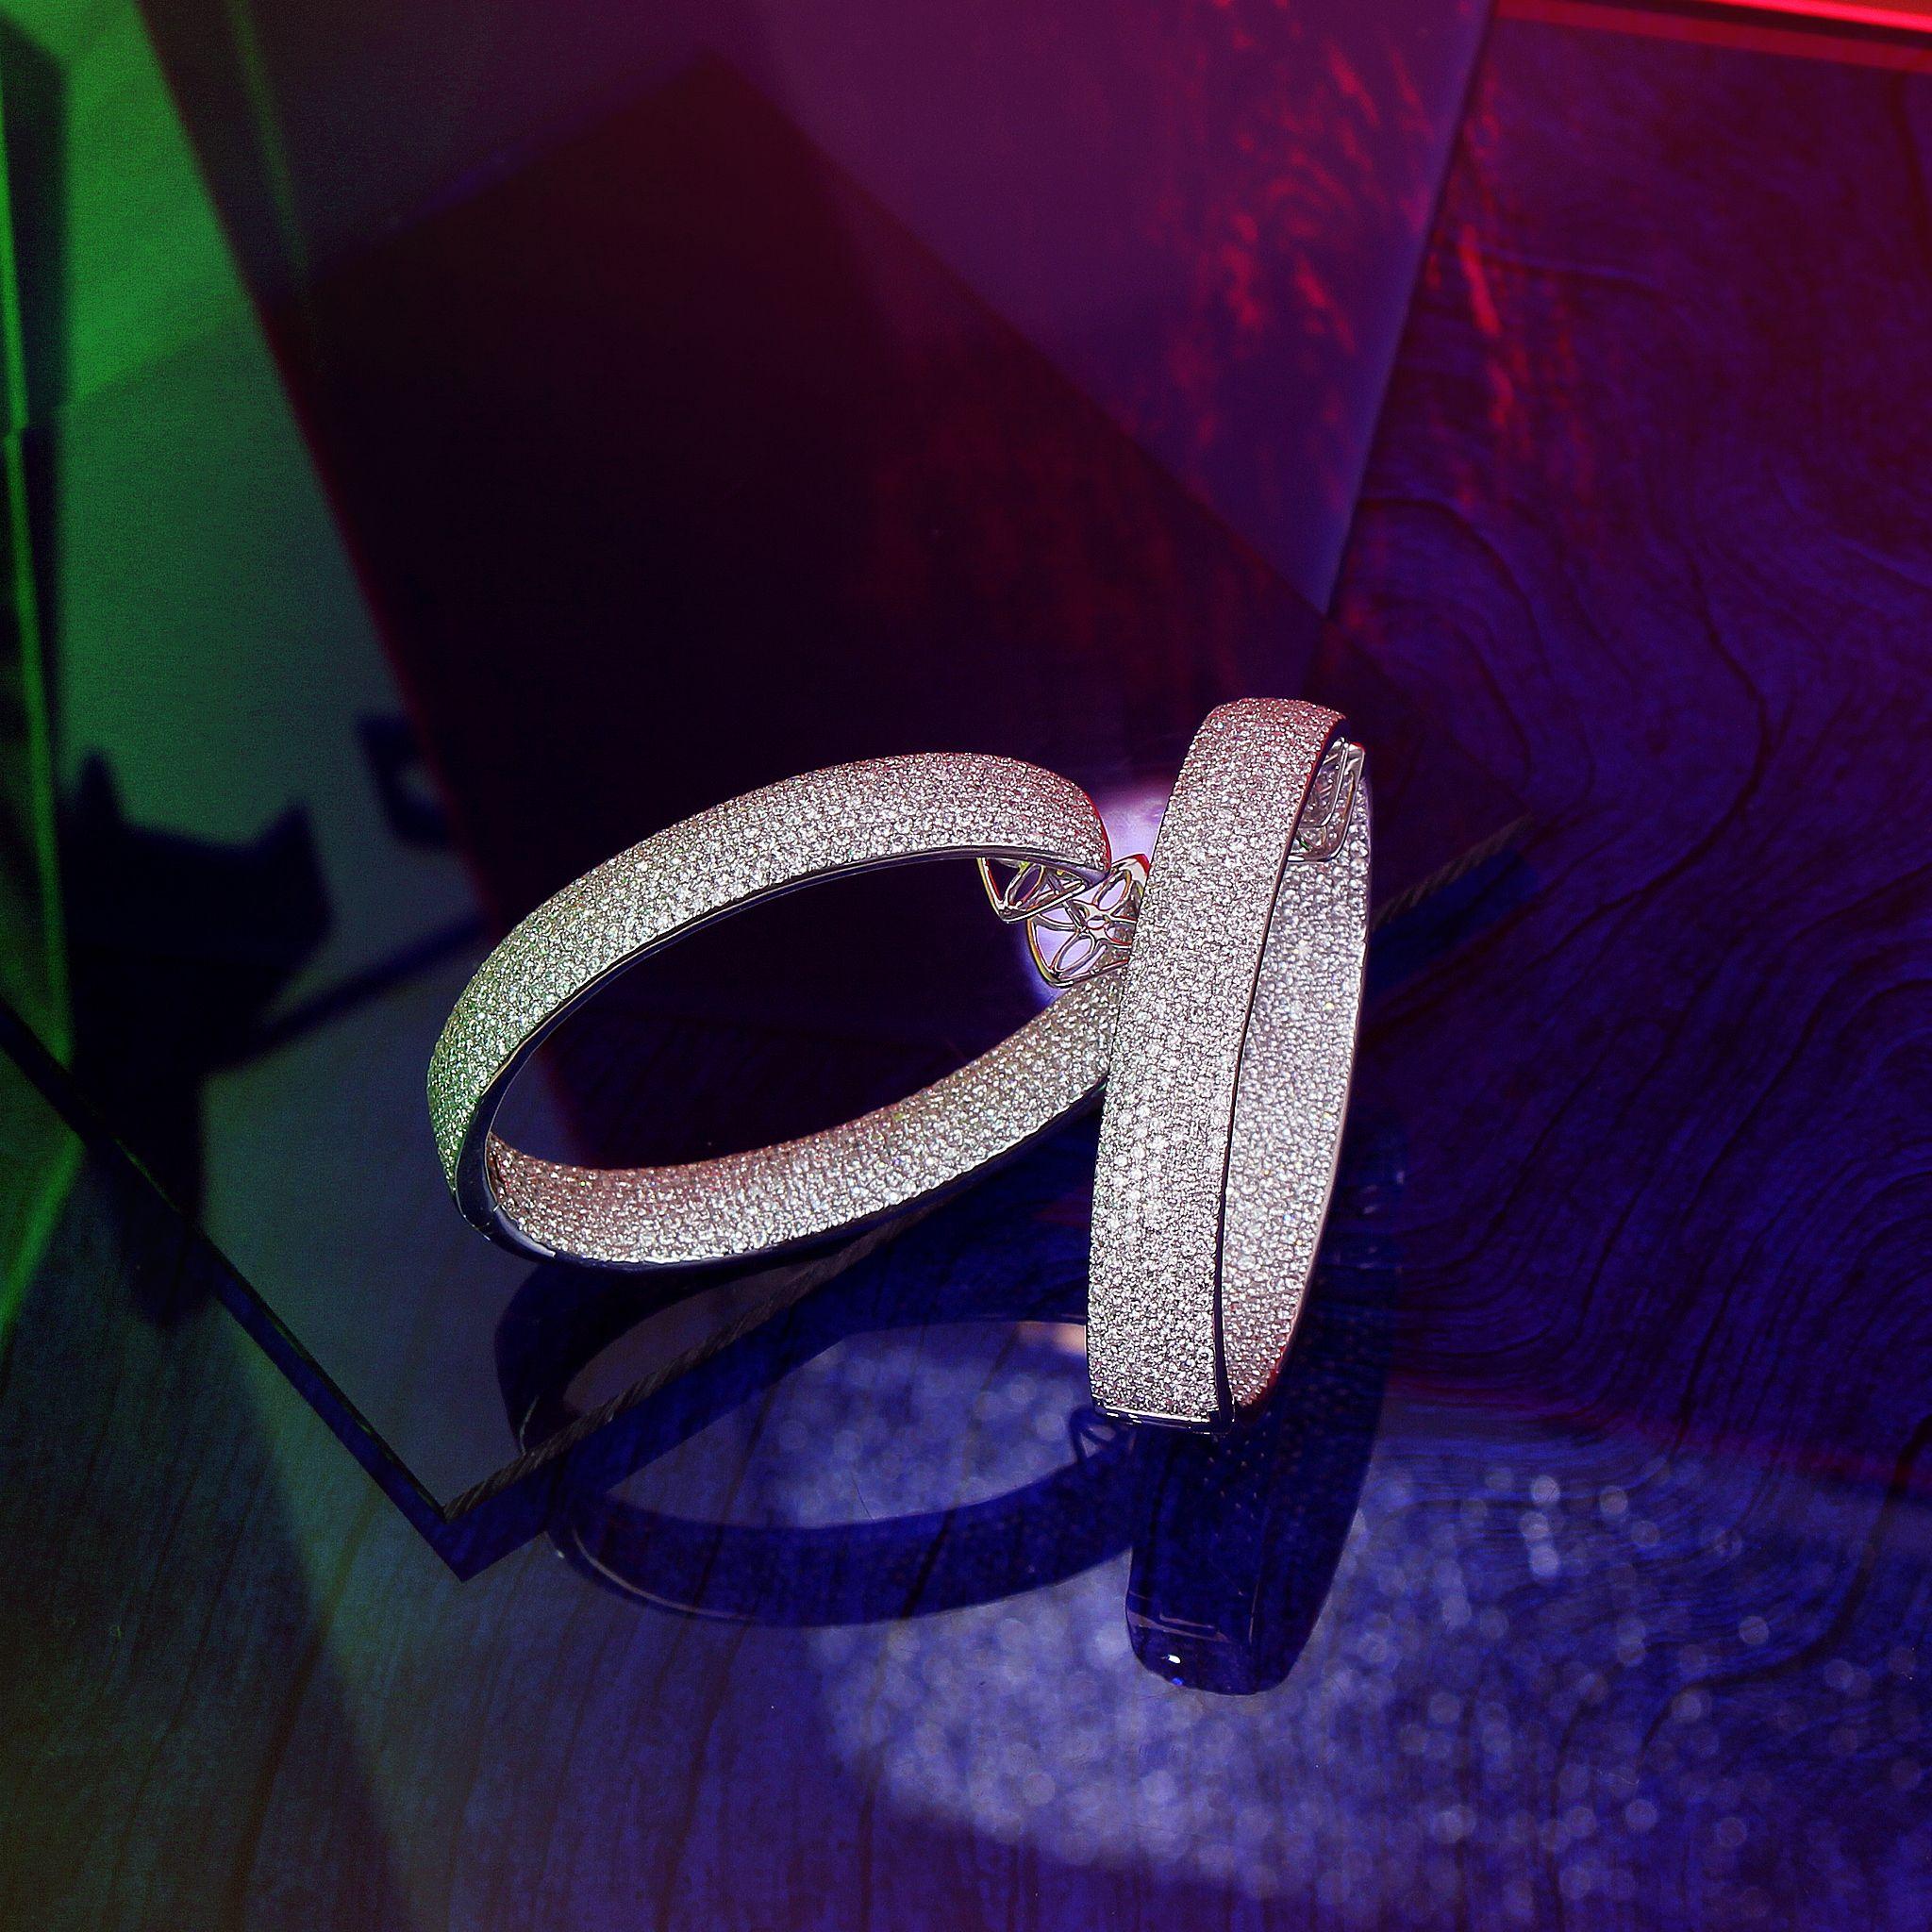 Pin By Tanisha Williams On Fashion Diamond Hoop Earrings